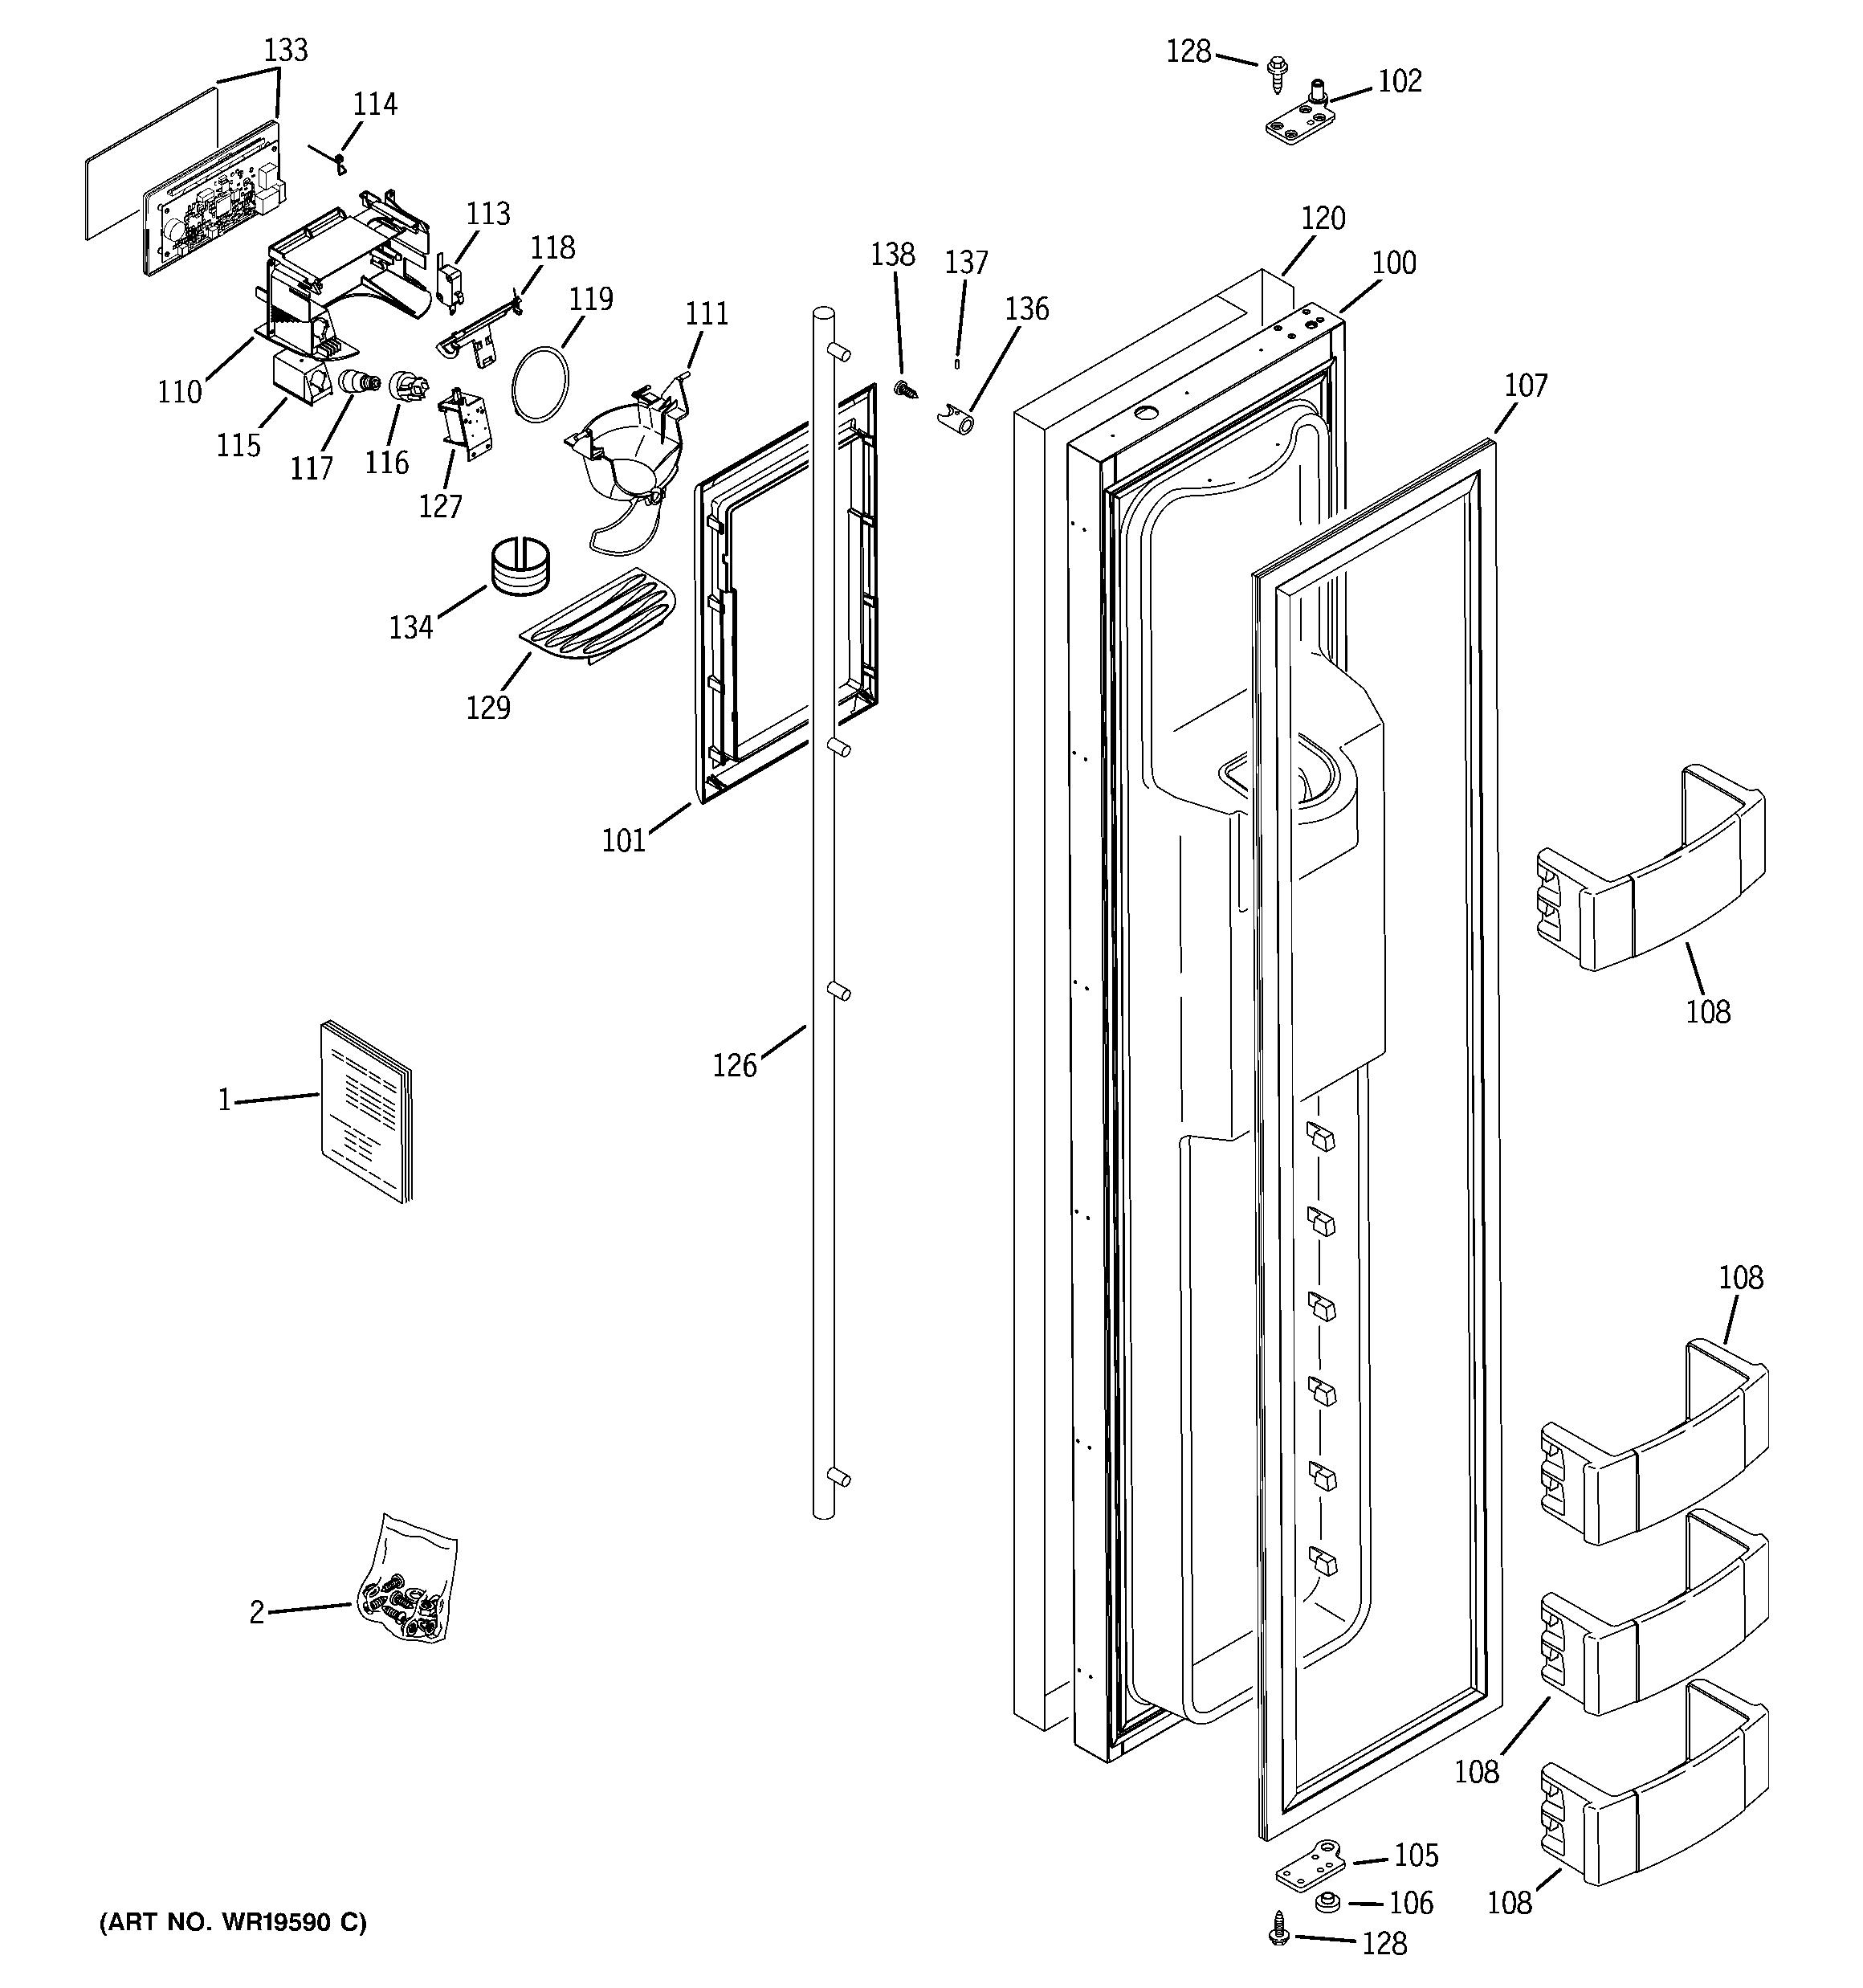 ge monogram refrigerator parts diagram 2001 saturn sl wiring r series model ziss480drgss